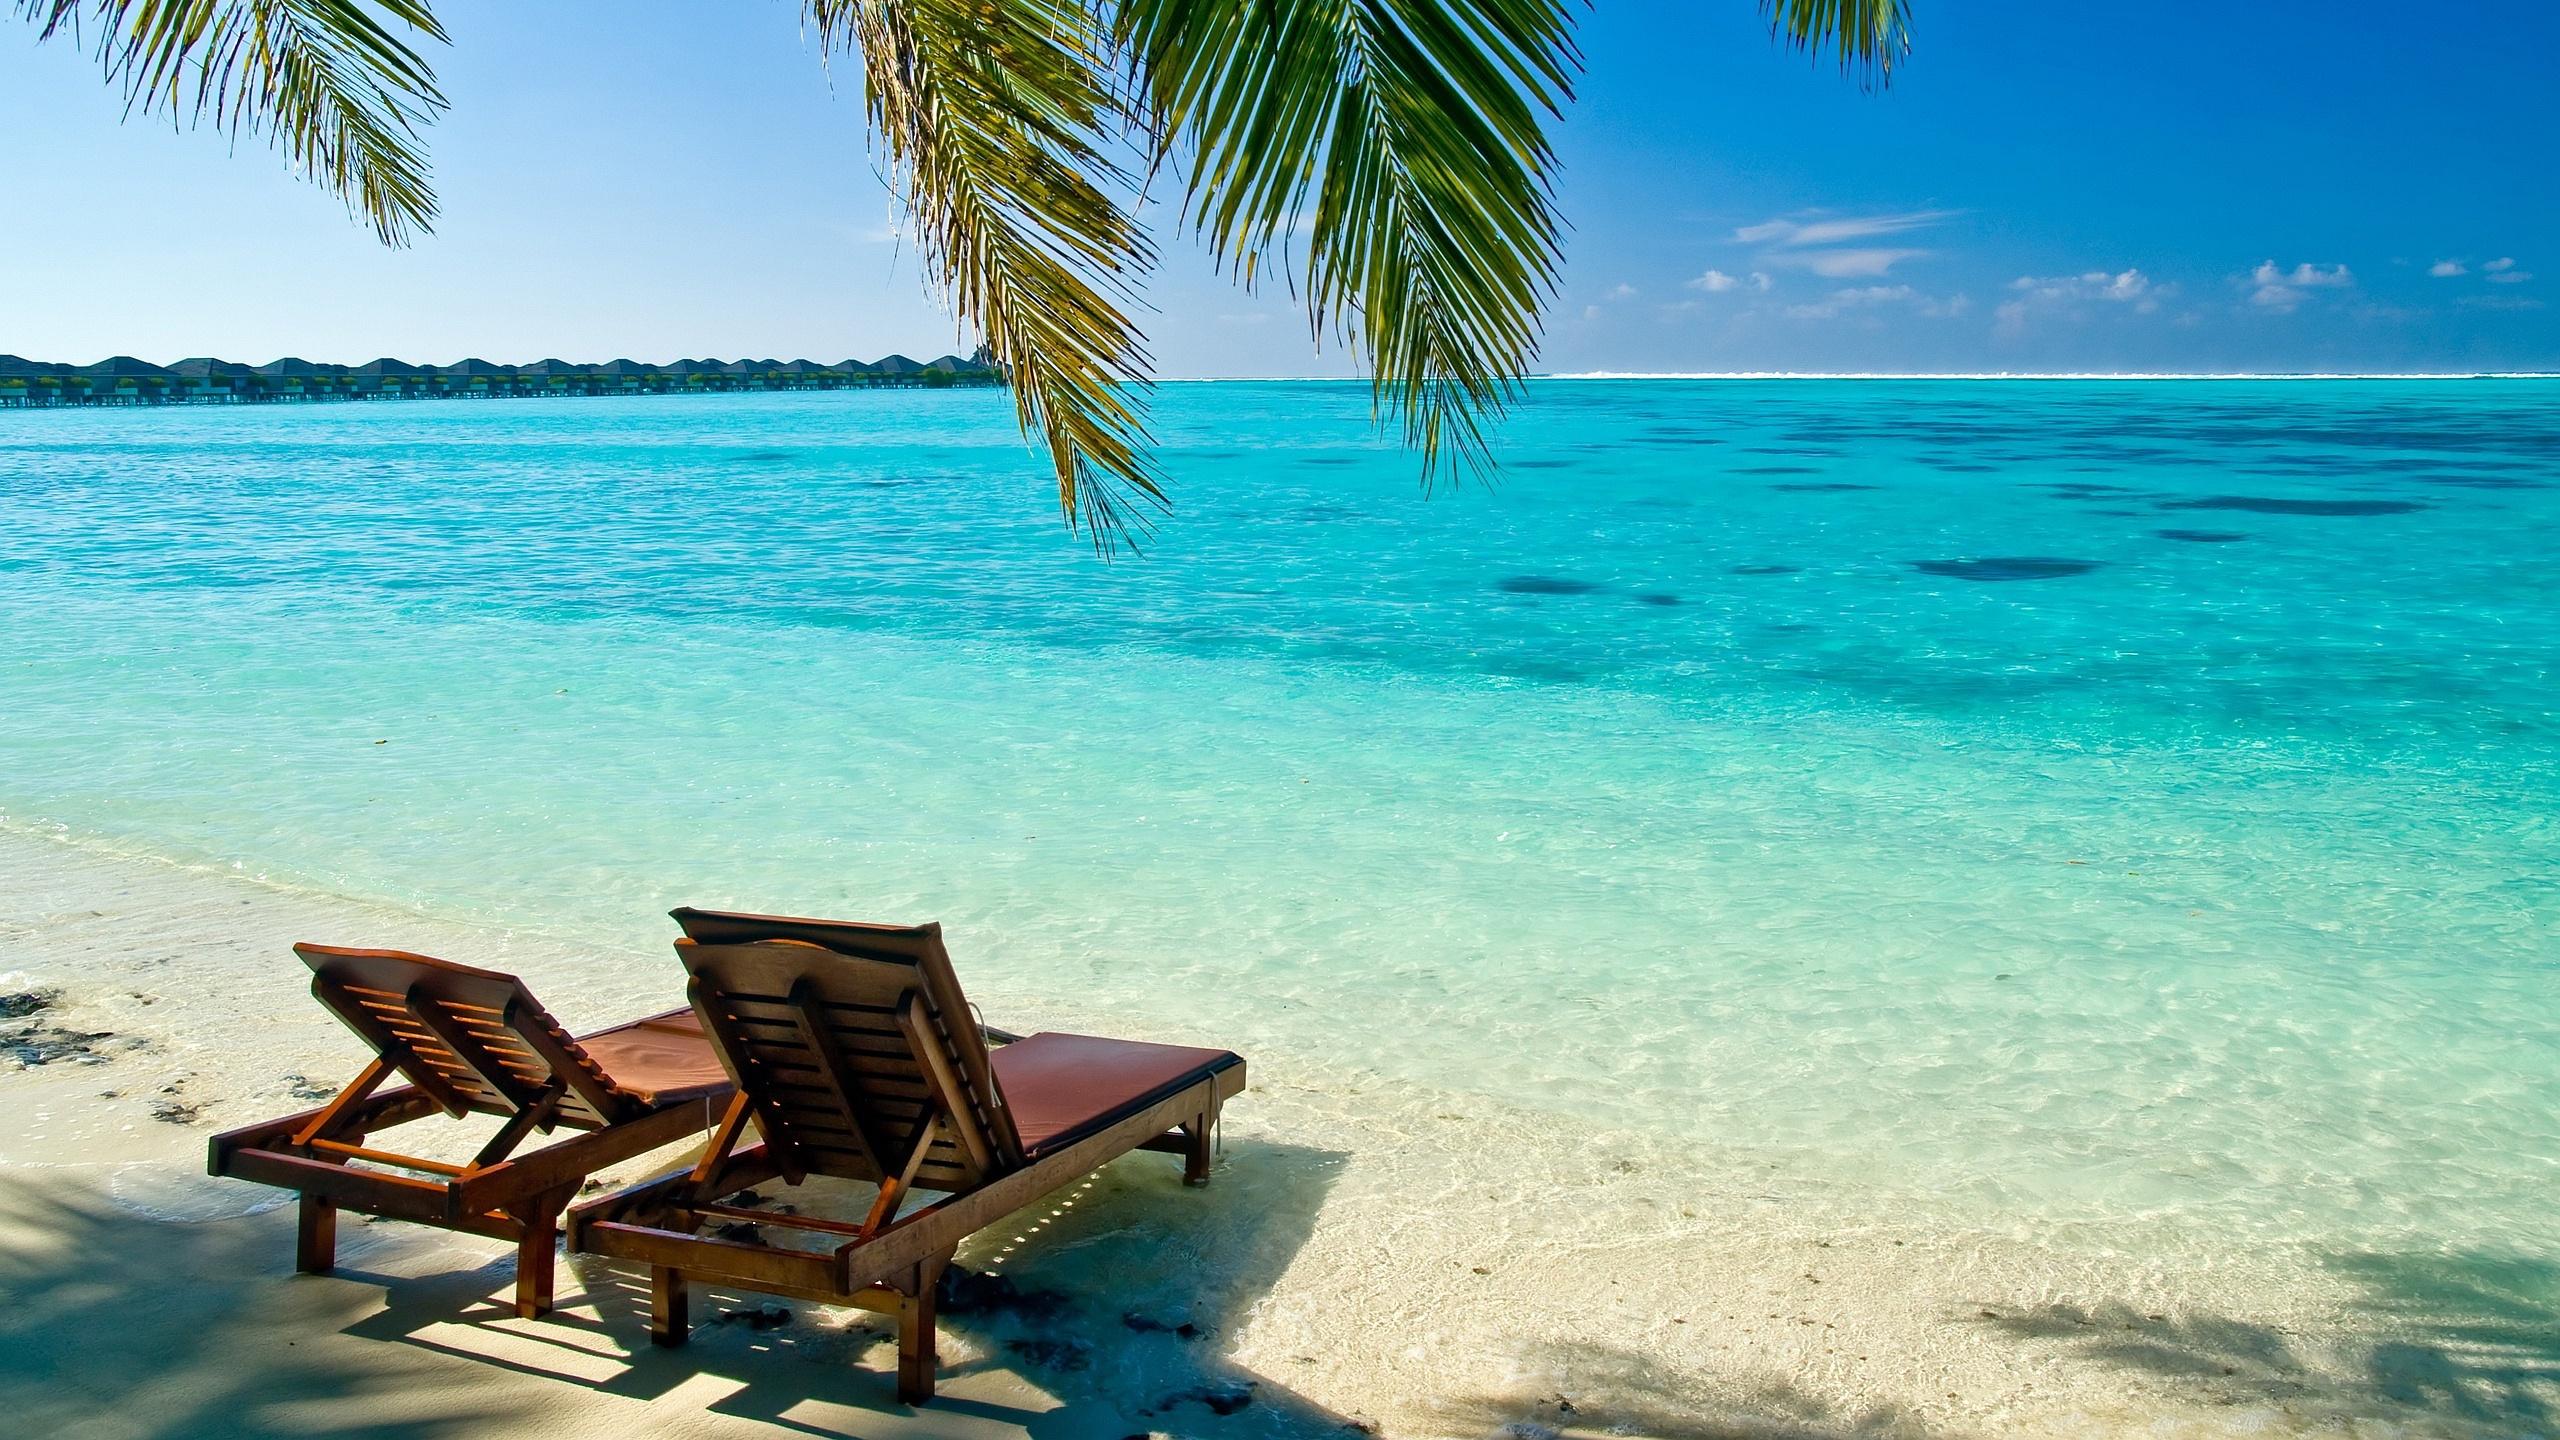 Tropical Beach Desktop Backgrounds Wallpaper Description The Above Is 2560x1440